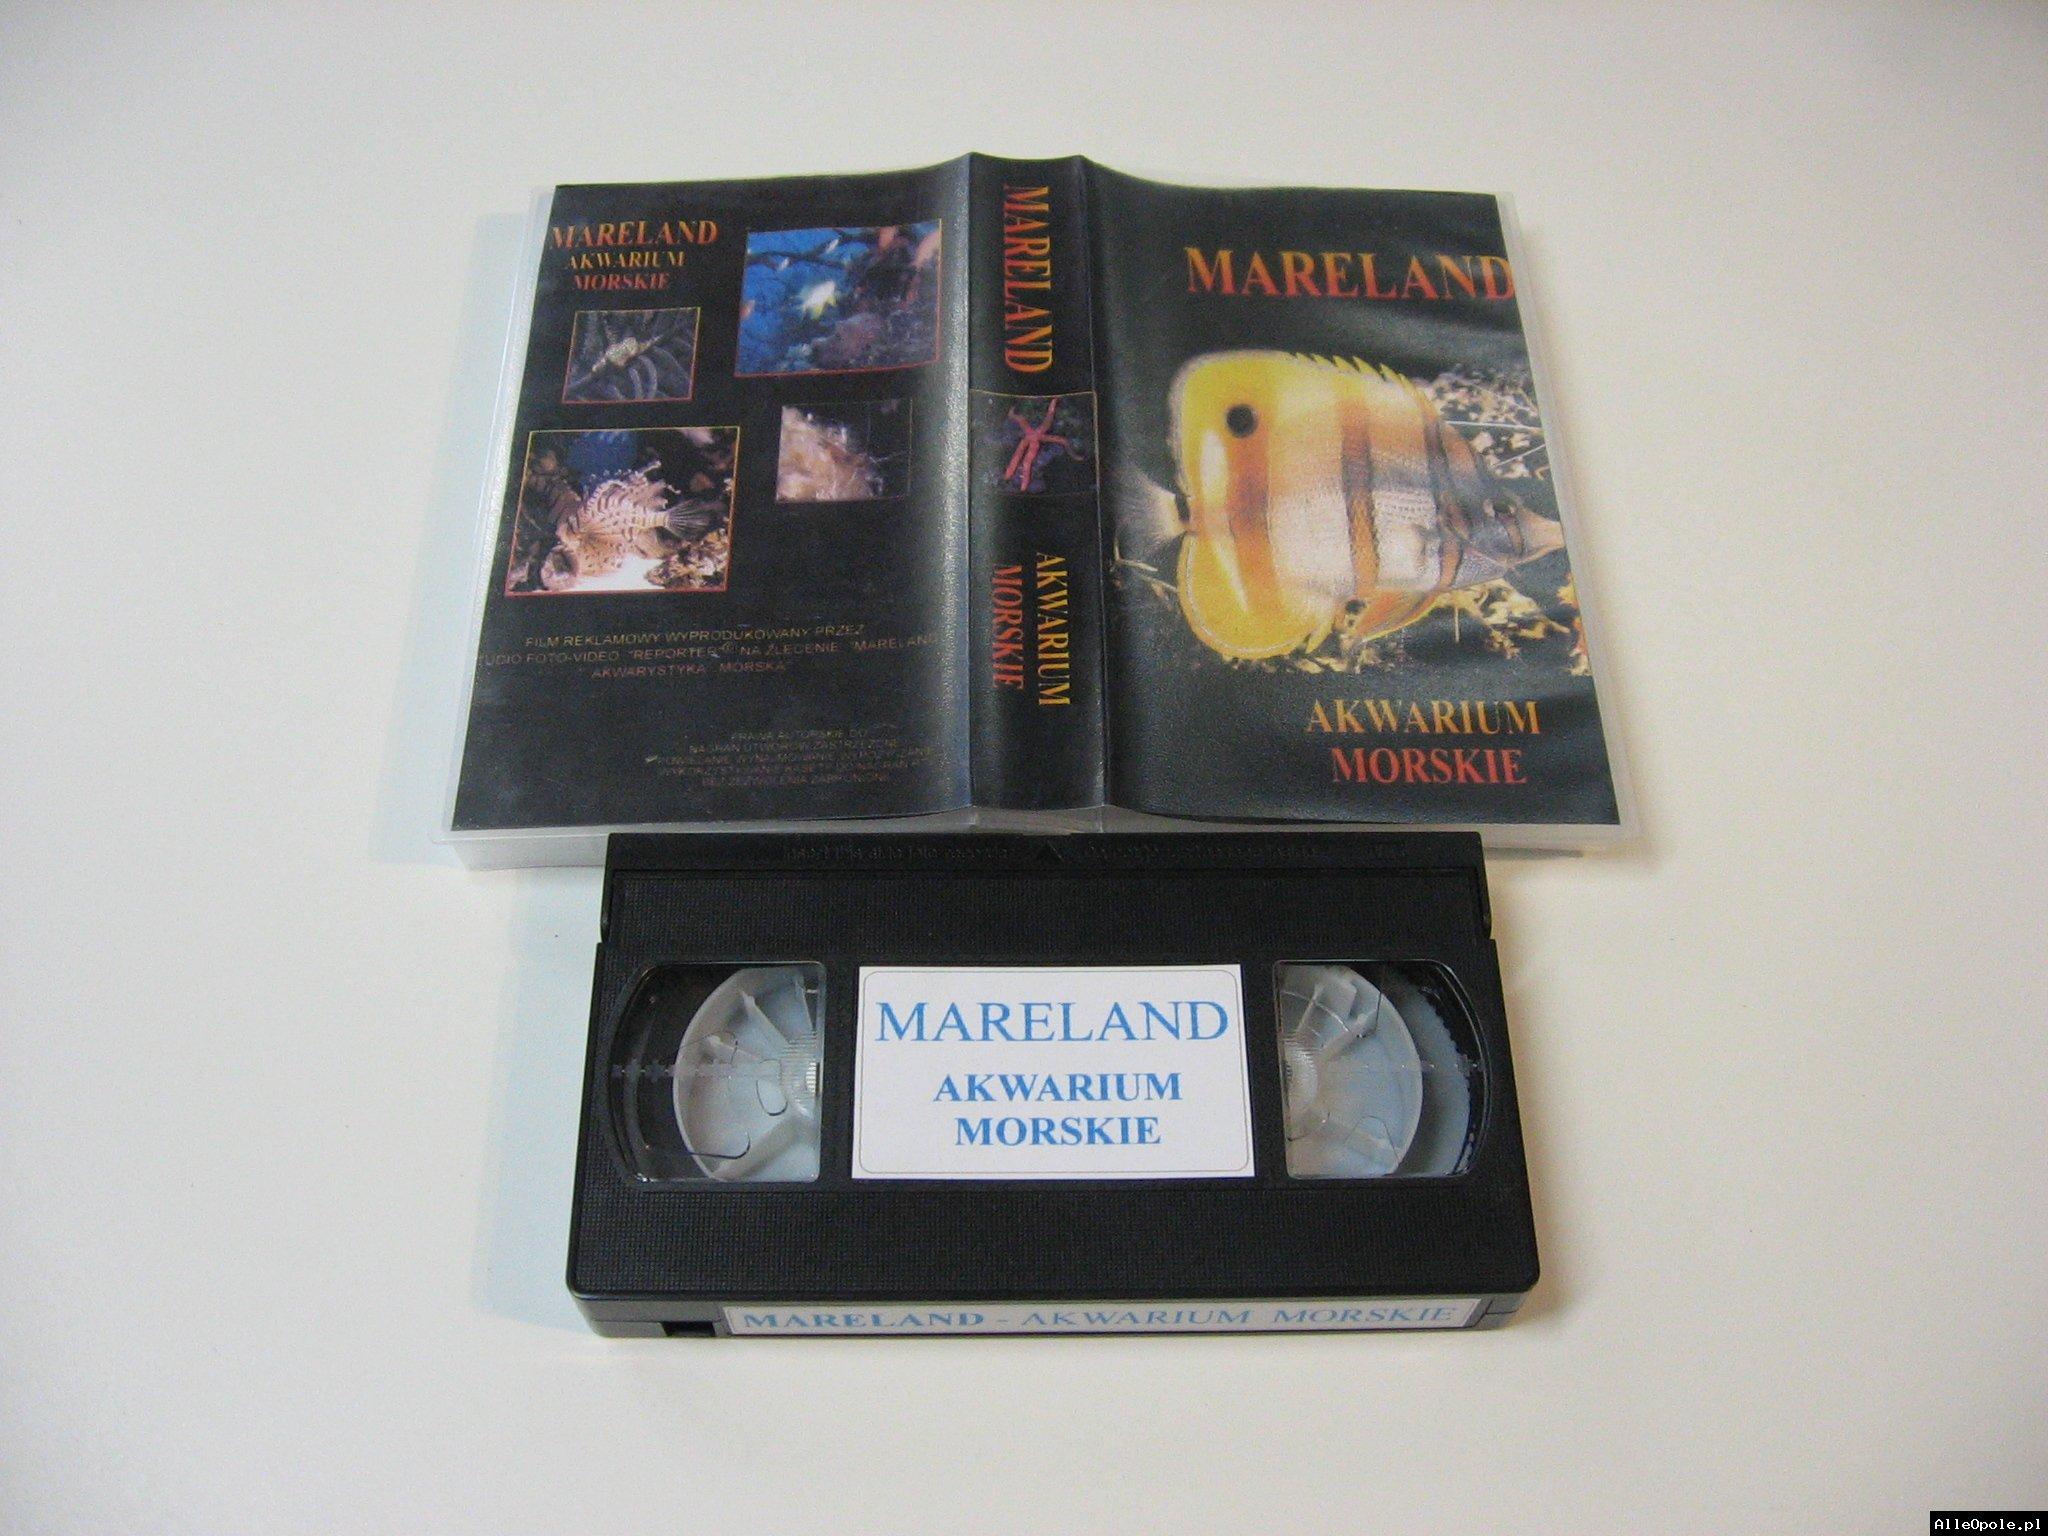 MARELAND AKWARIUM MORSKIE - VHS Kaseta Video - Opole 1756